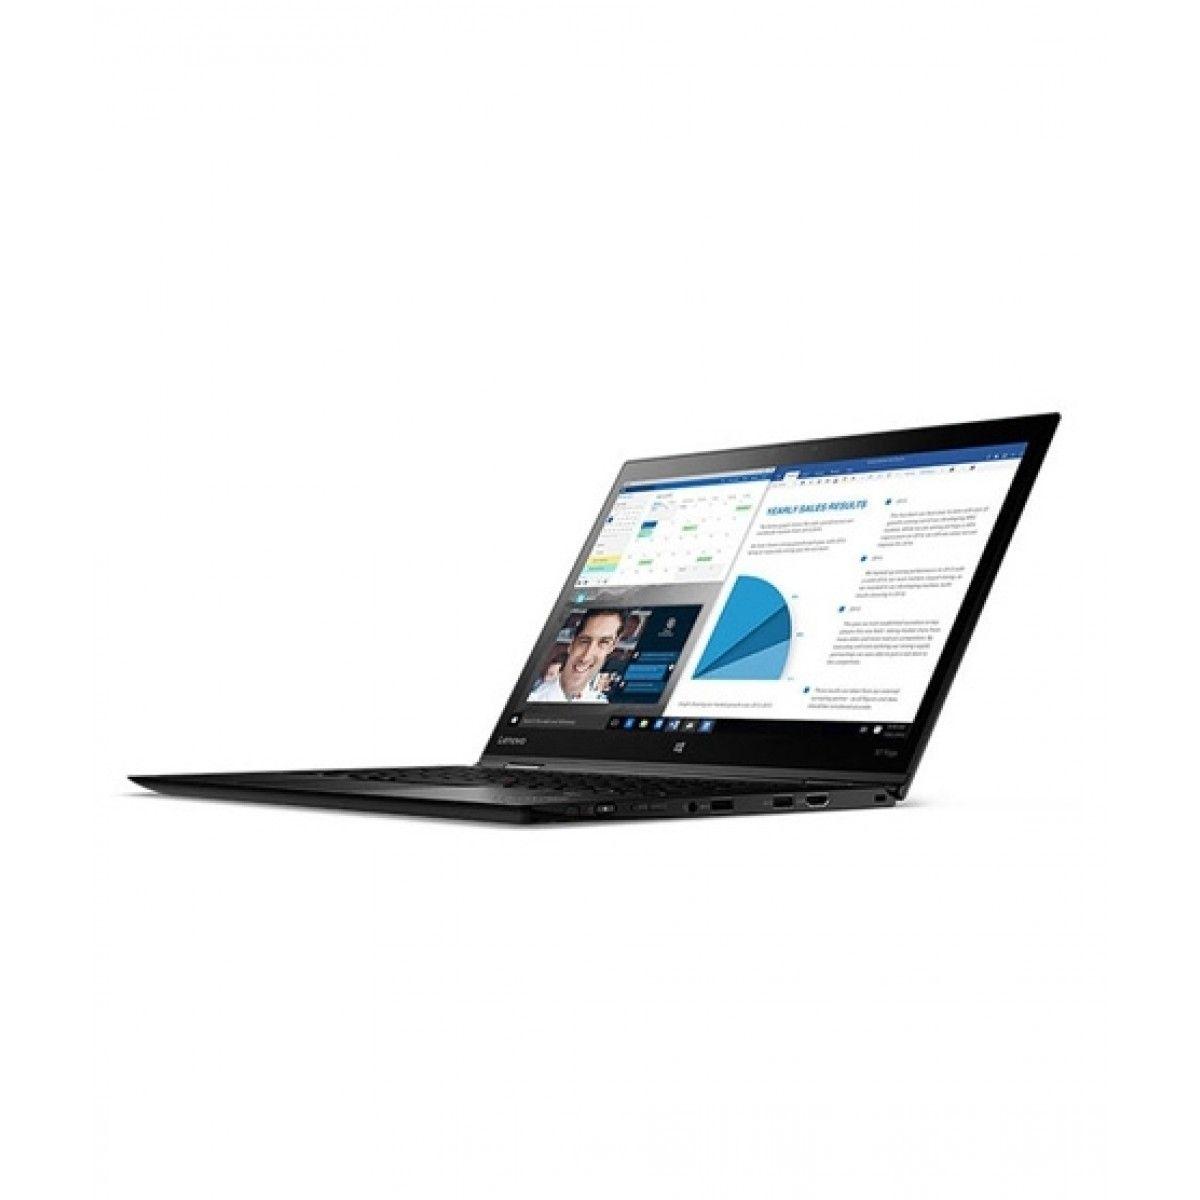 "Lenovo ThinkPad X1 Yoga 14"" Core i7 6th Gen Touch Notebook"